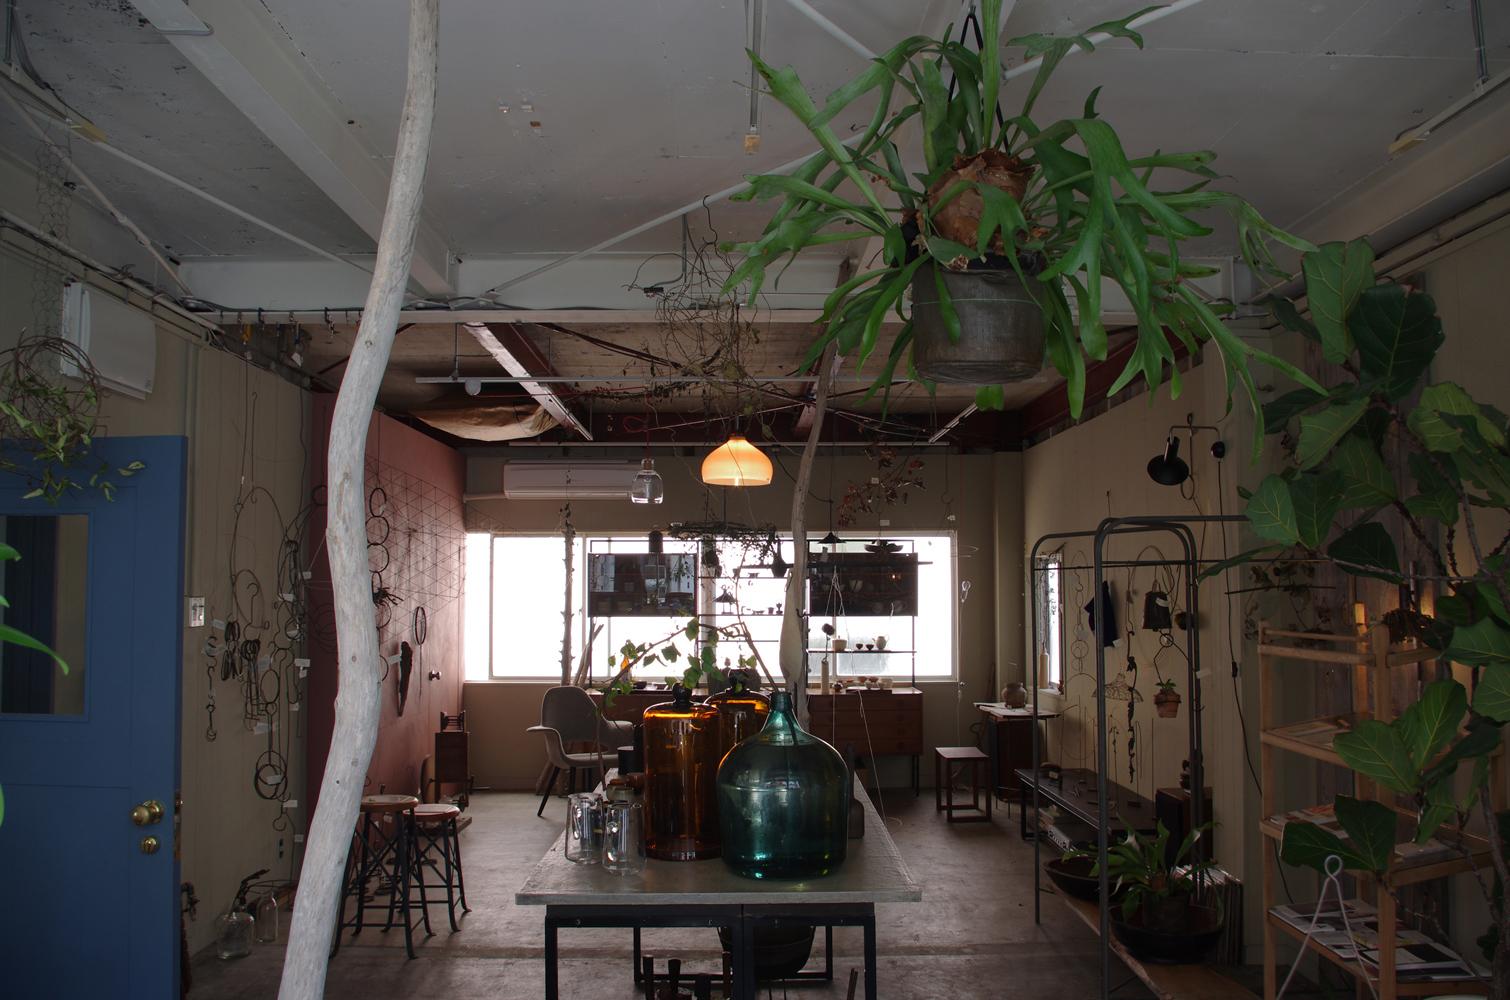 tipura-studio-ironworks-exhibition-33